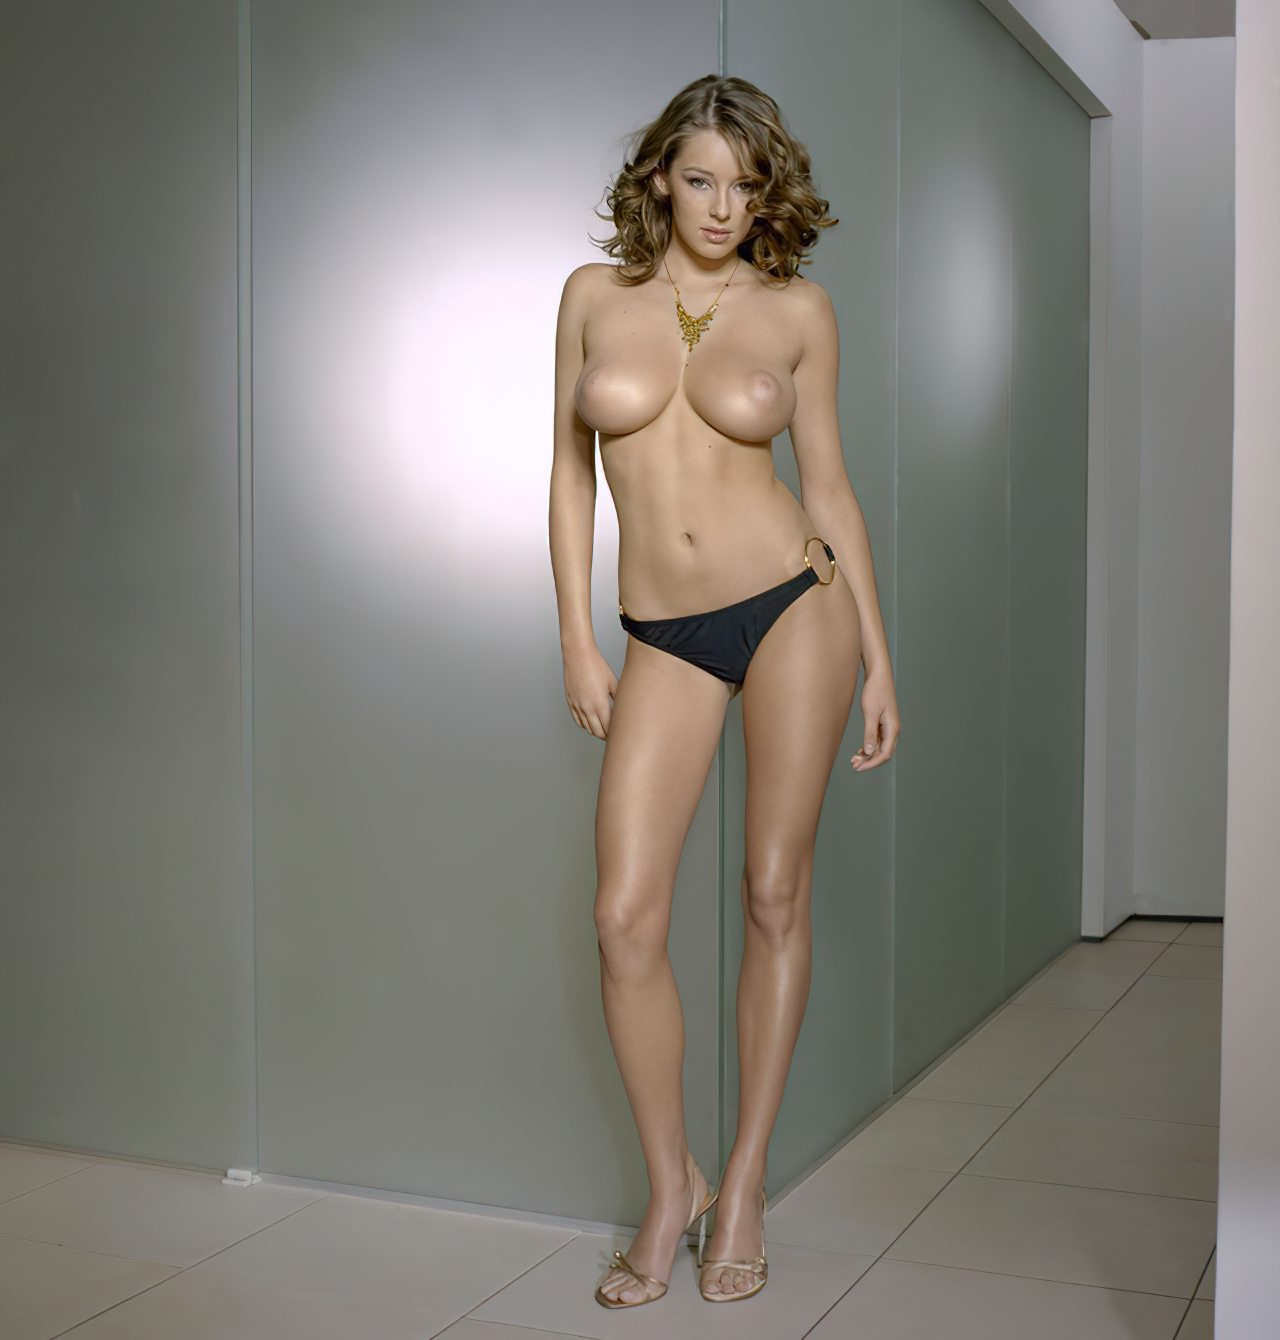 Fotos Mulheres Despidas (43)